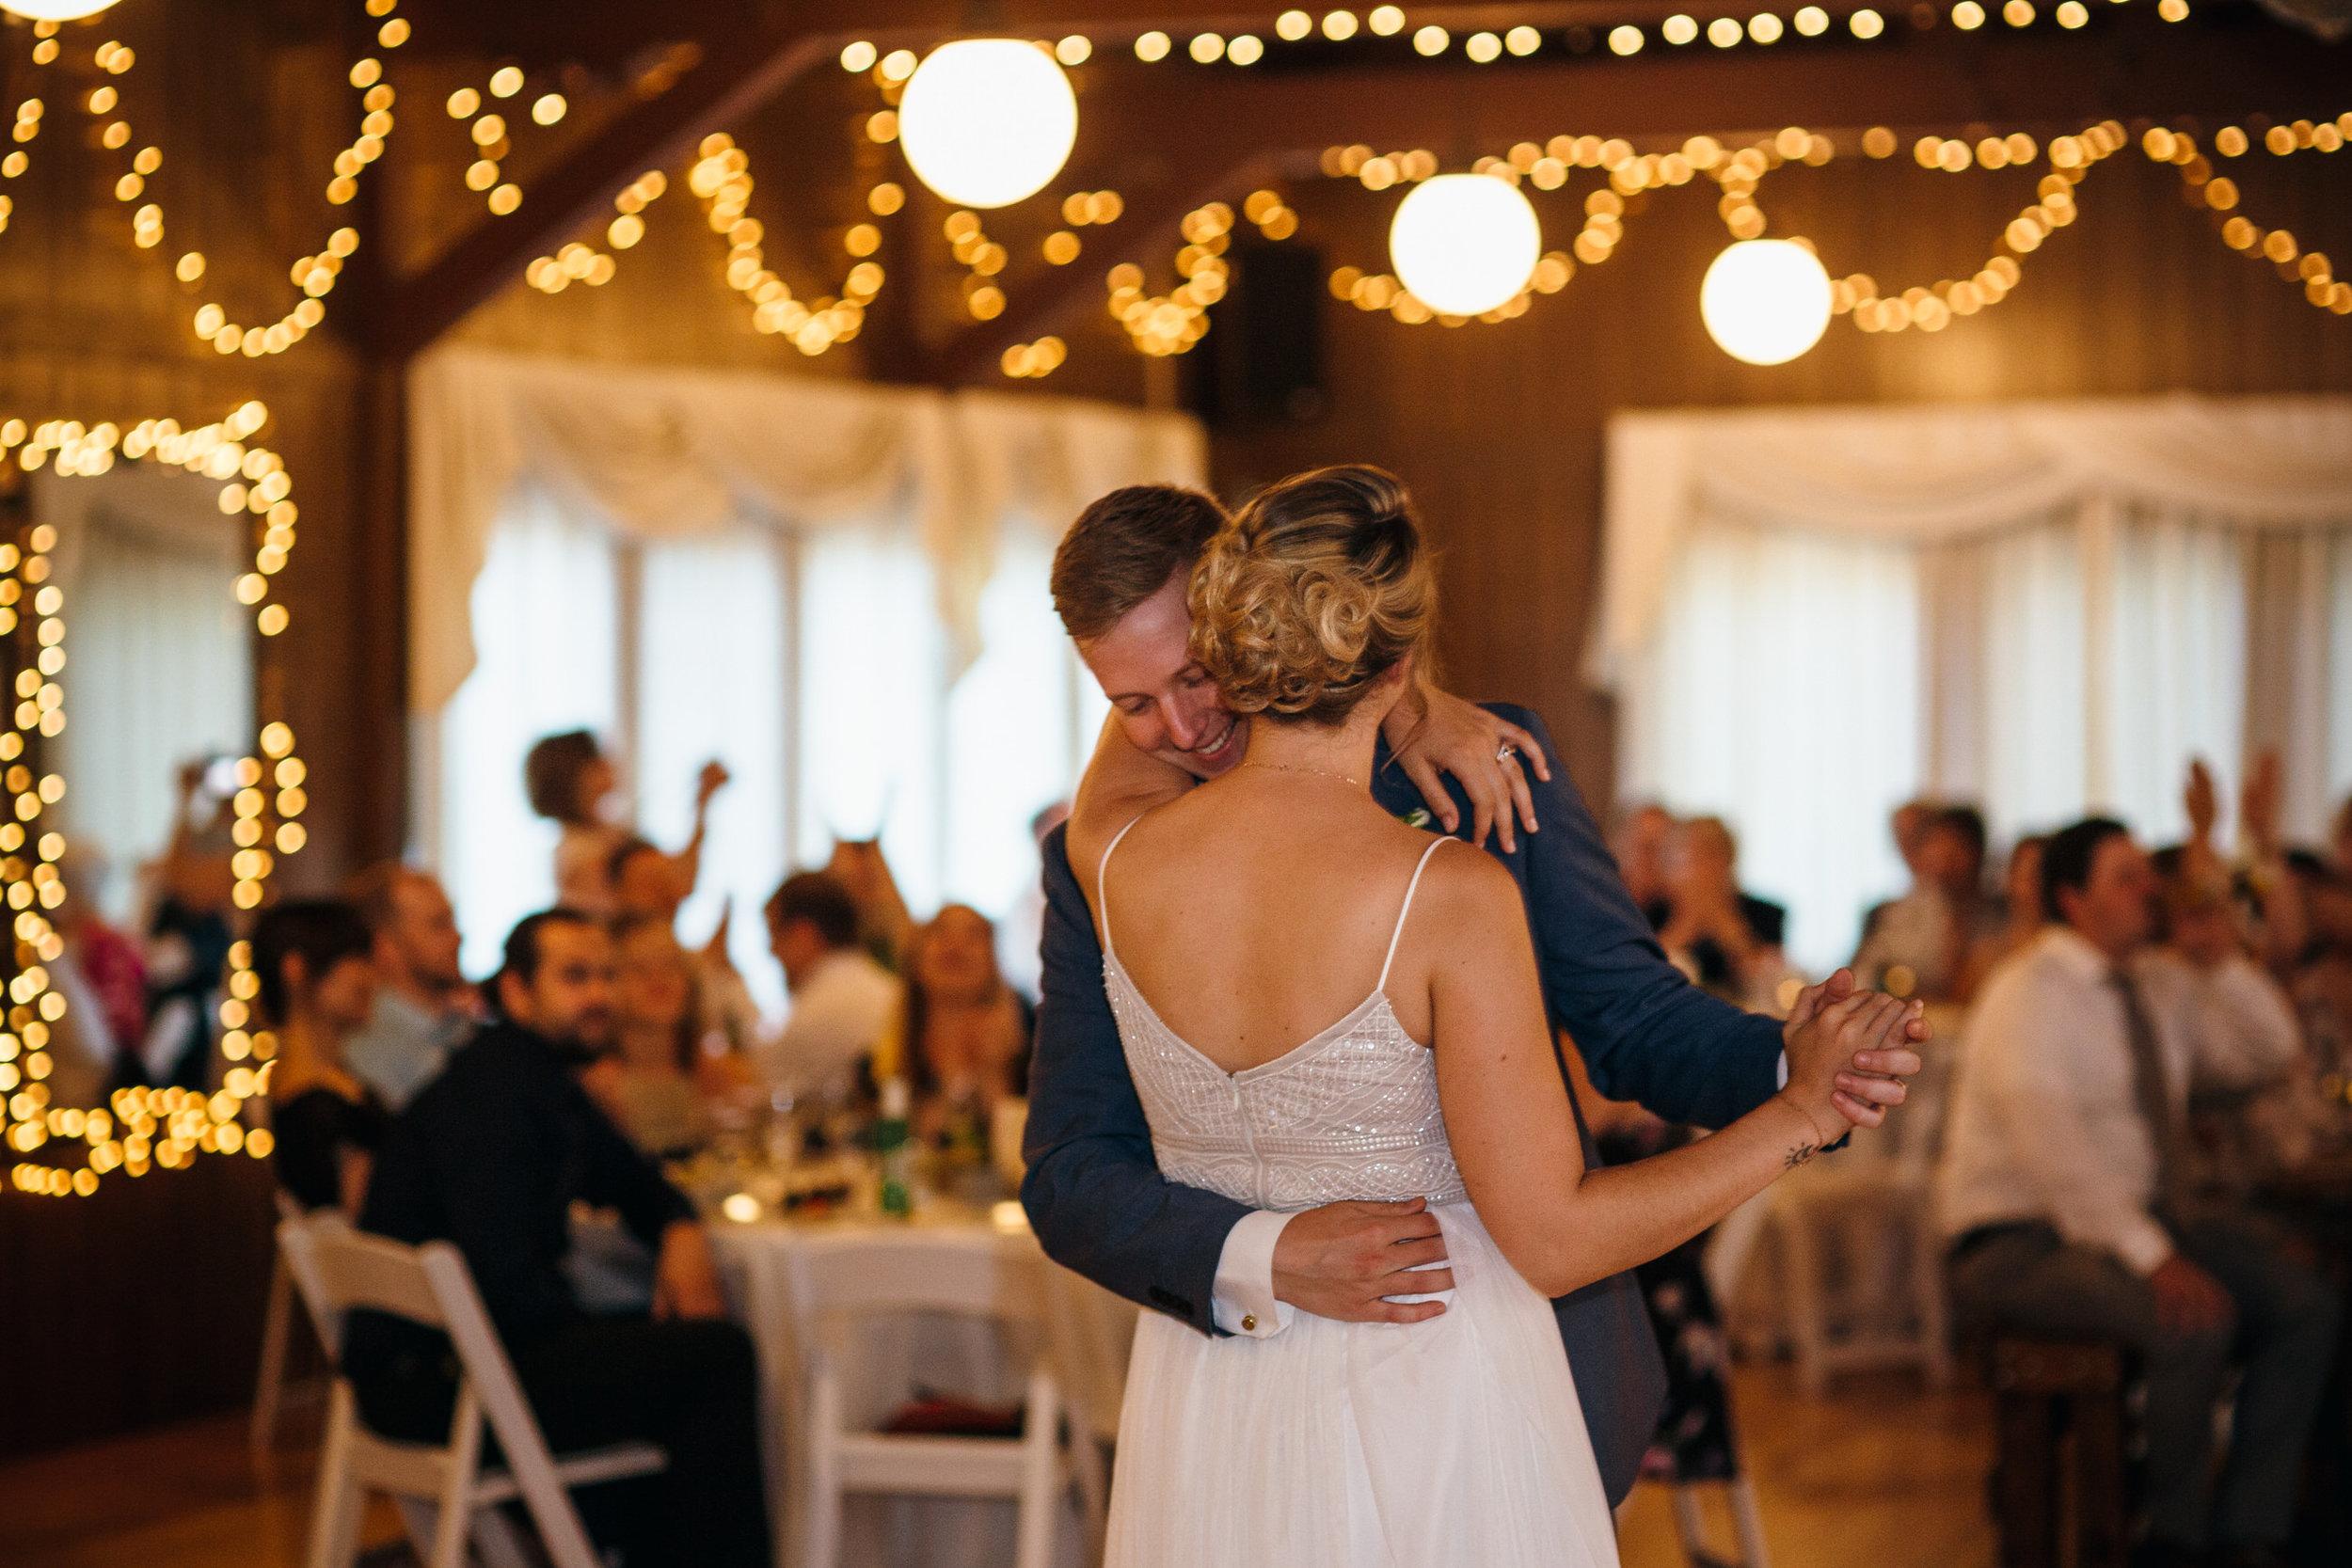 Laurelhurst Park club wedding photographer Portand pdx Oregon096.JPG